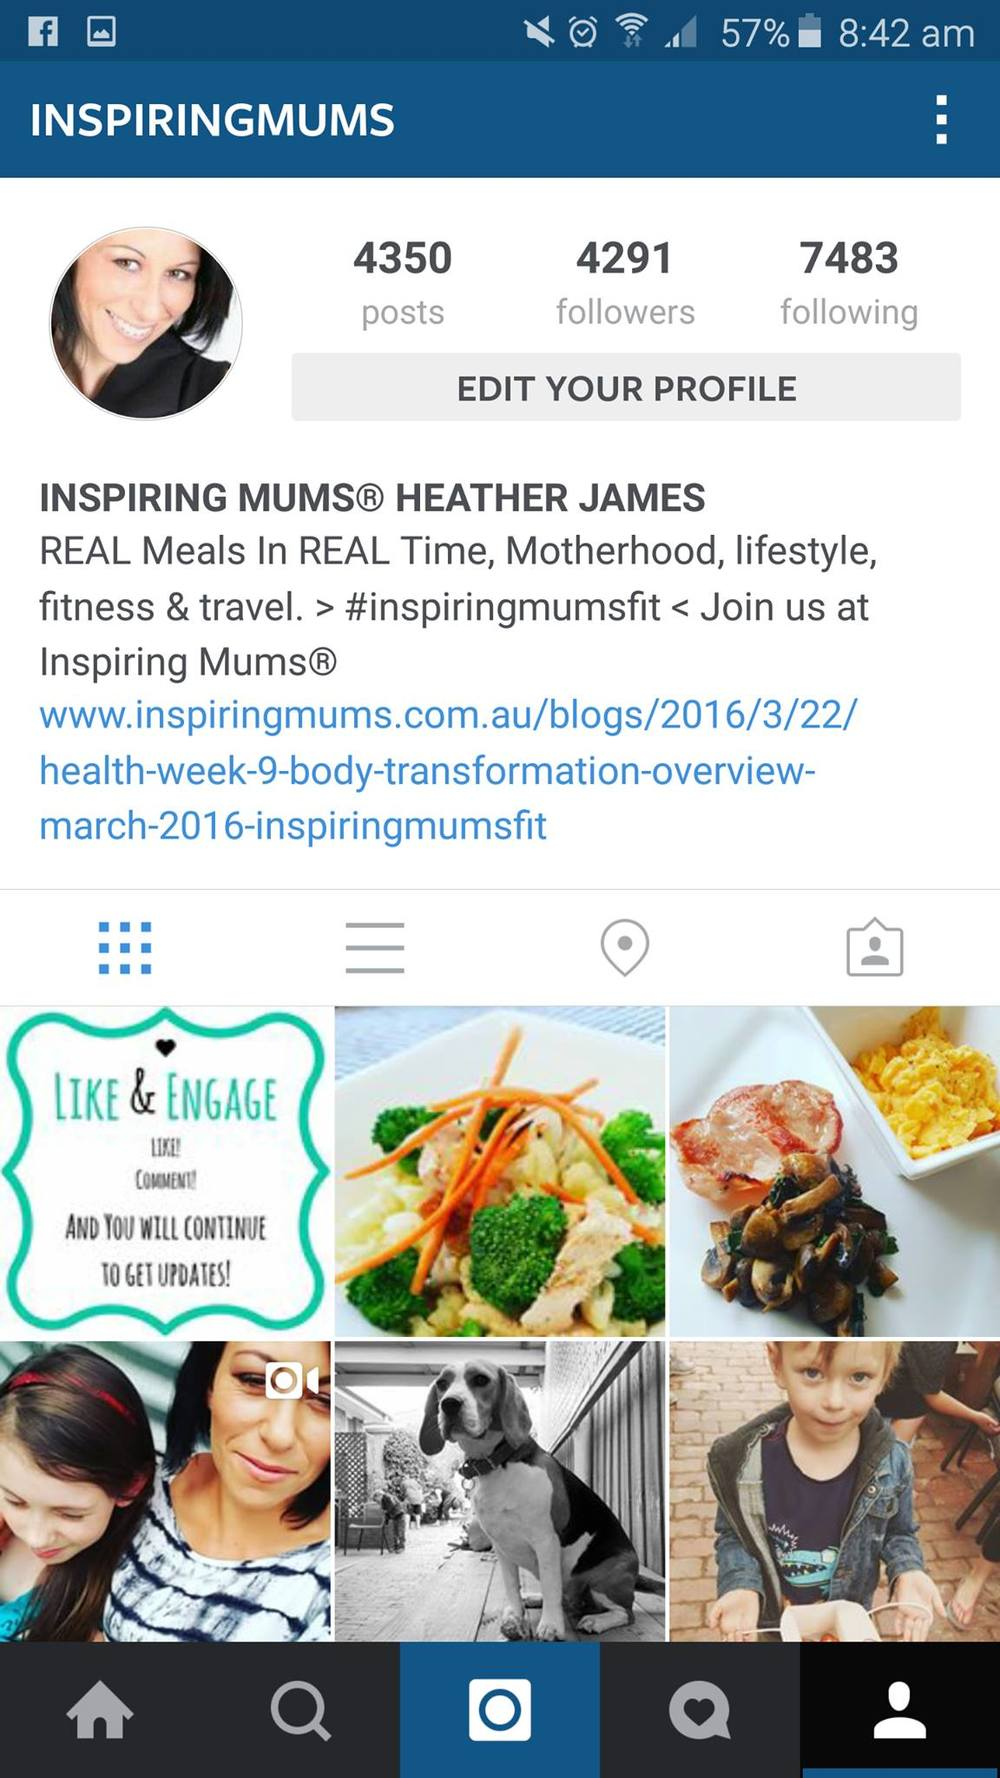 https://www.instagram.com/inspiringmums/ |  @inspiringmums |  #inspiringmums  |  #inspiringmumsfit